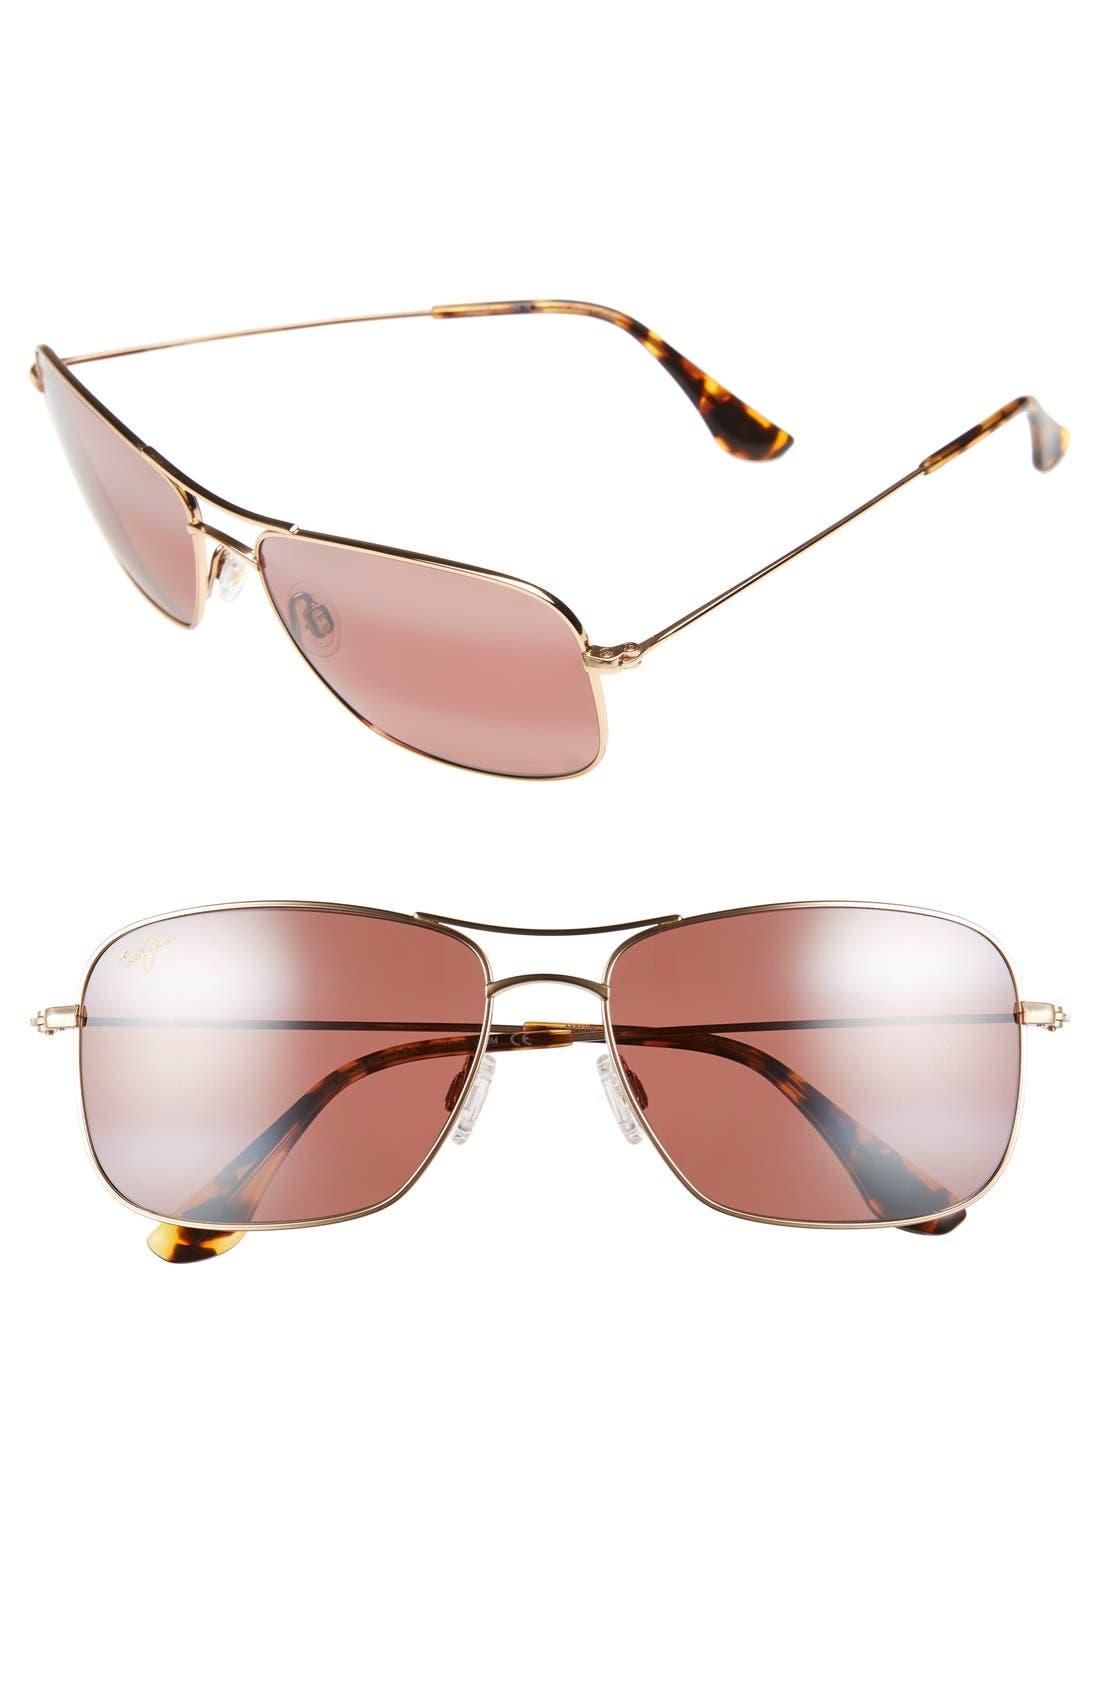 Wiki Wiki 59mm PolarizedPlus2<sup>®</sup> Sunglasses,                         Main,                         color, GOLD/ MAUI ROSE